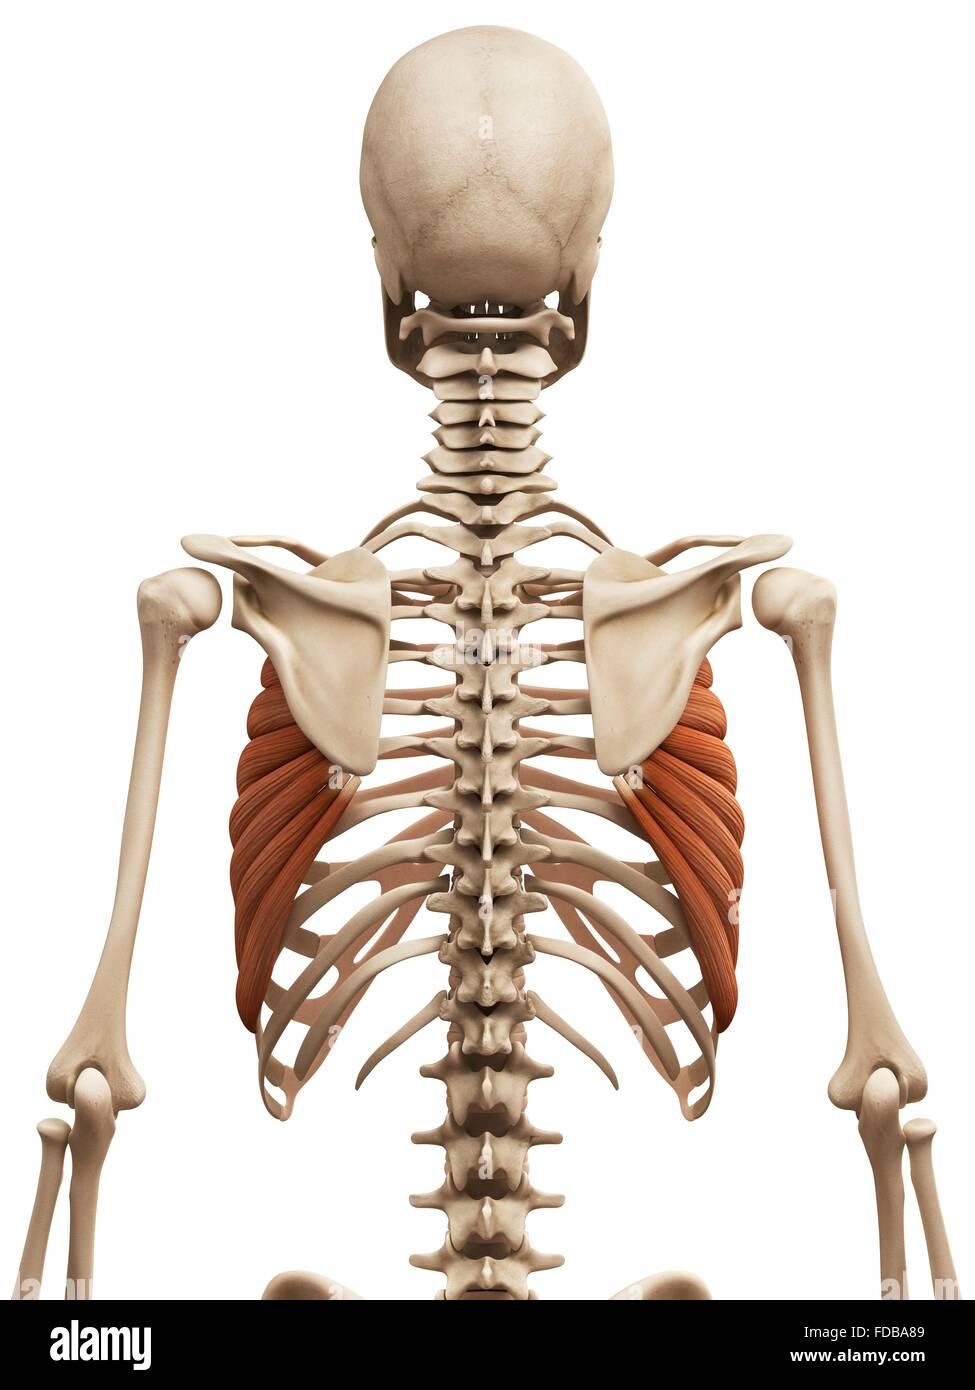 Menschliche Muskeln (Serratus anterior), Illustration Stockfoto ...